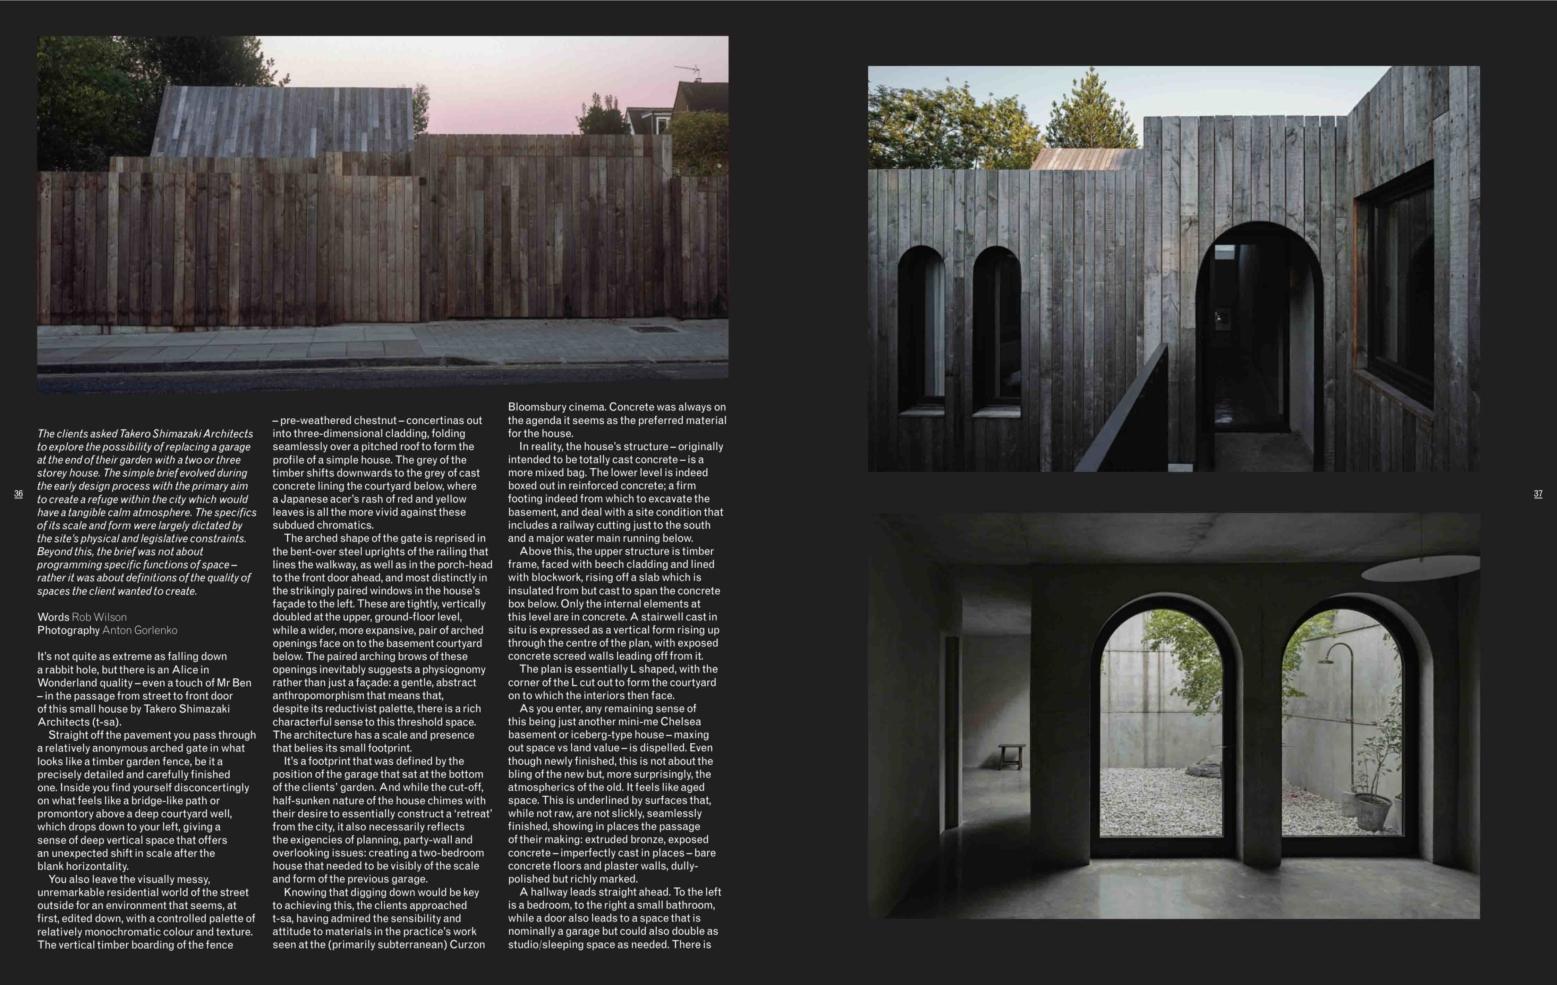 t-sa_Tiverton_Architects Journal_02